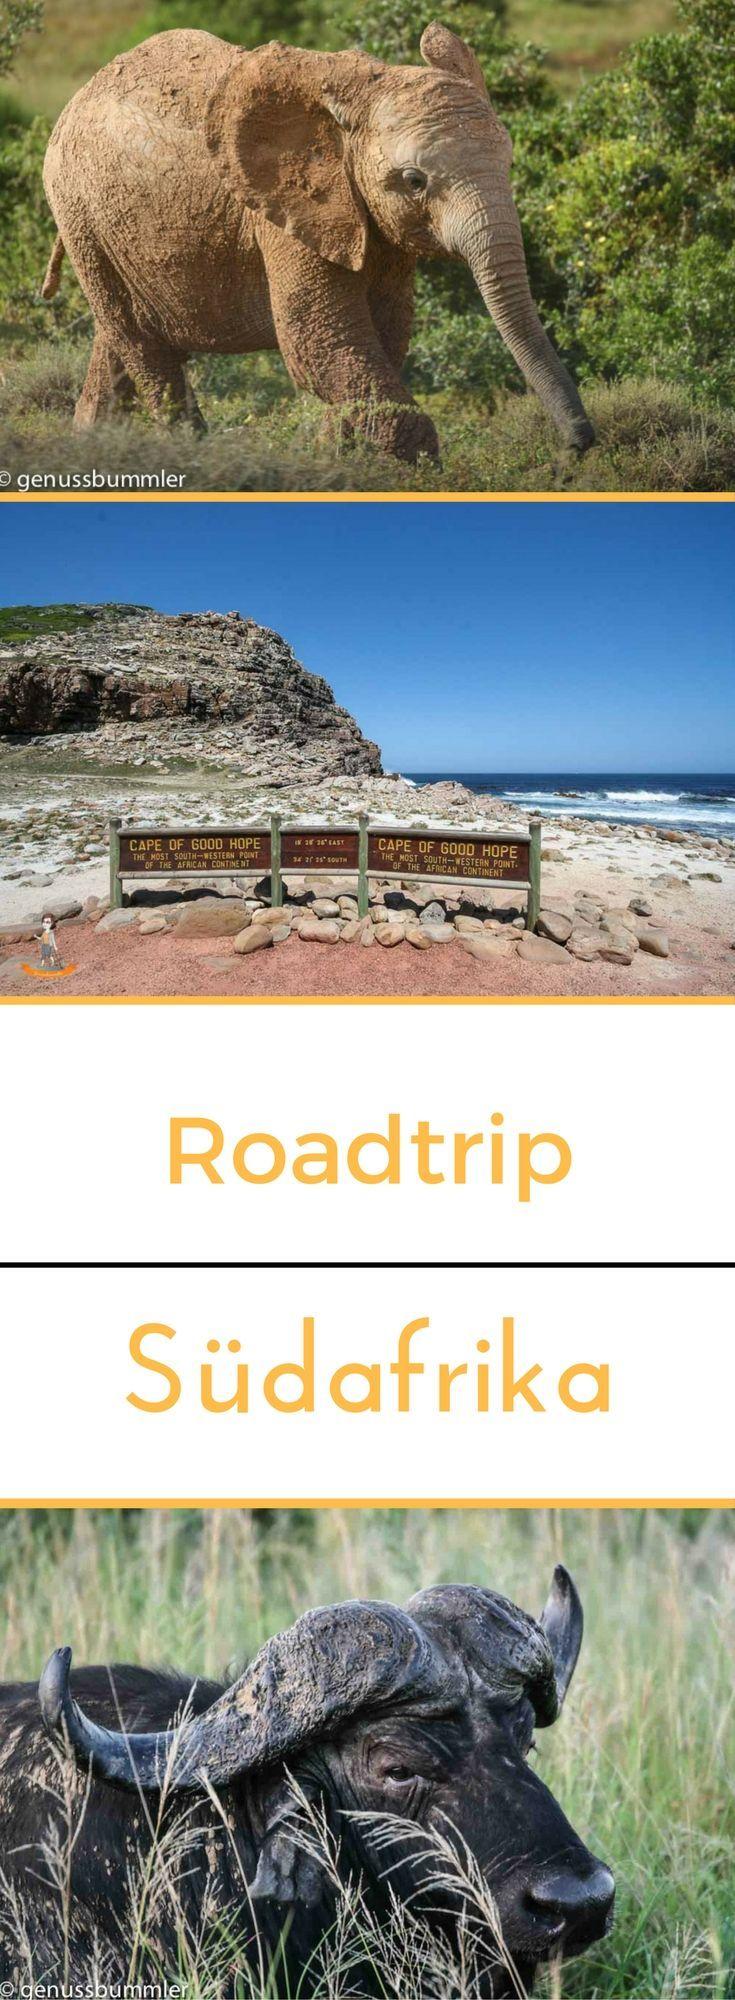 Roadtrip 8: Stadt, Safari und Natur in Südafrika